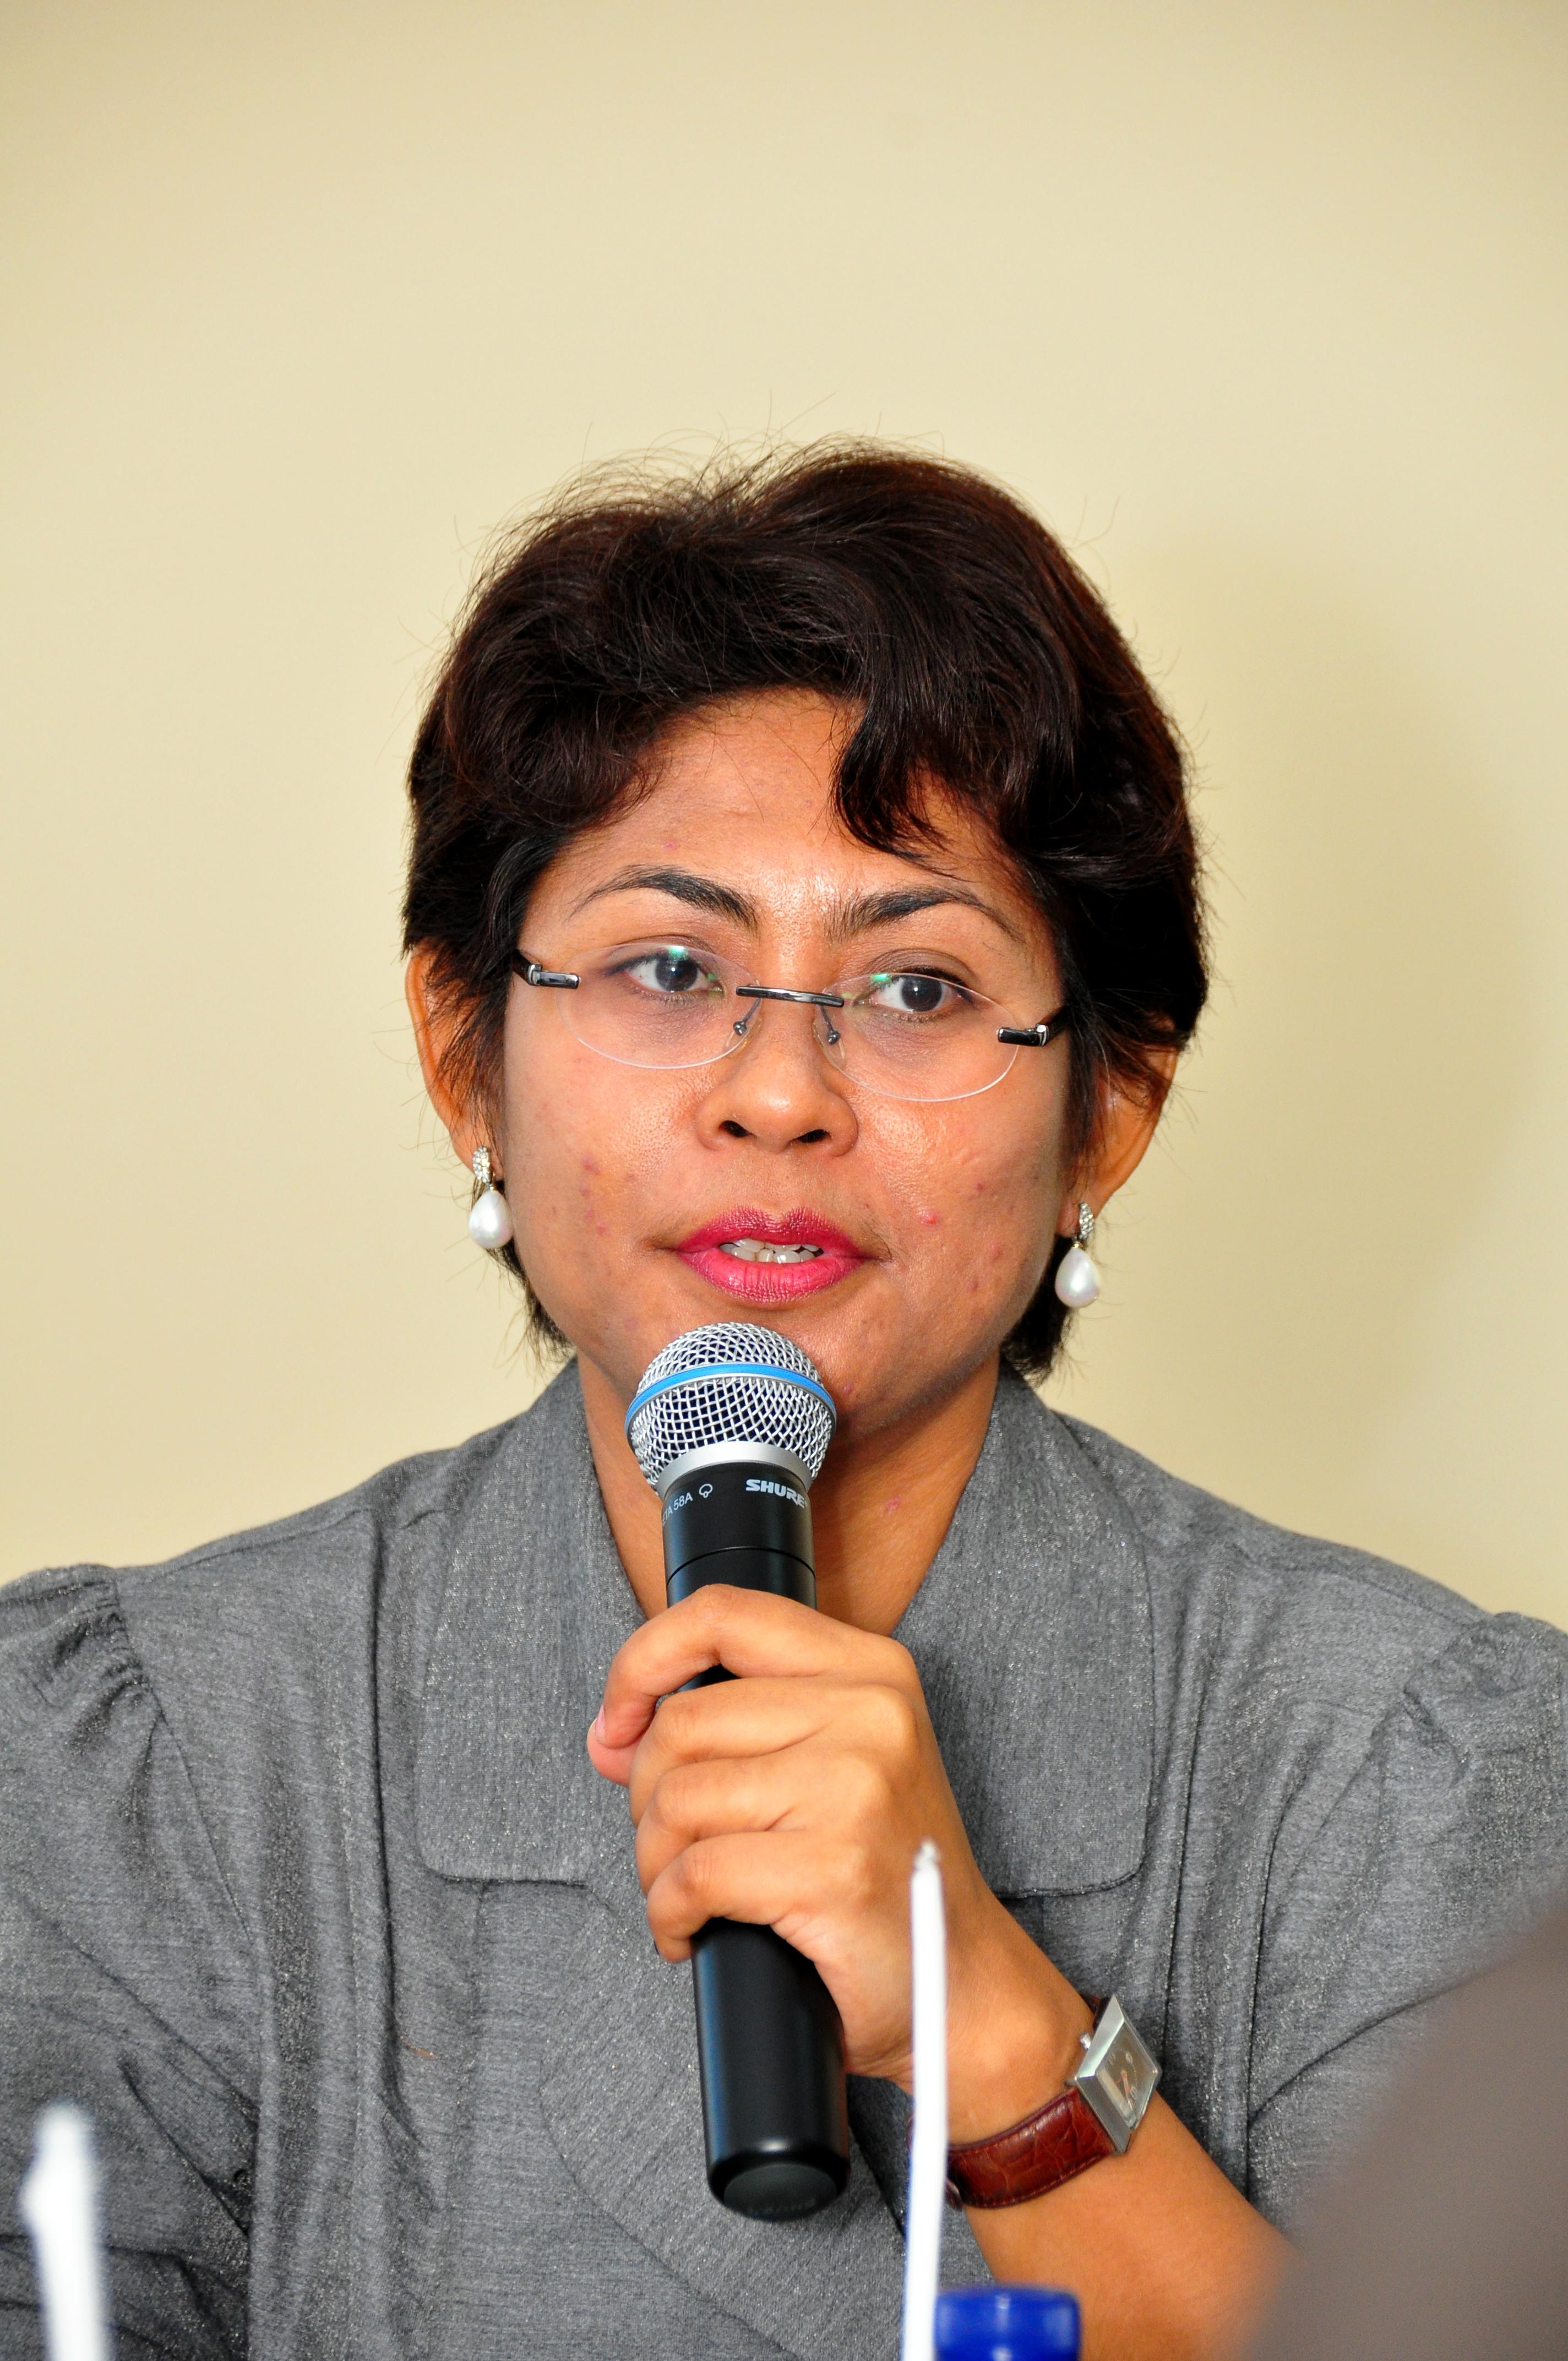 Ketua Badan Anggaran DPRD Provinsi Maluku, Ibu Mercy Ch. Barends, ST menyampaikan maksud dan tujuan atas kunjungan tersebut.